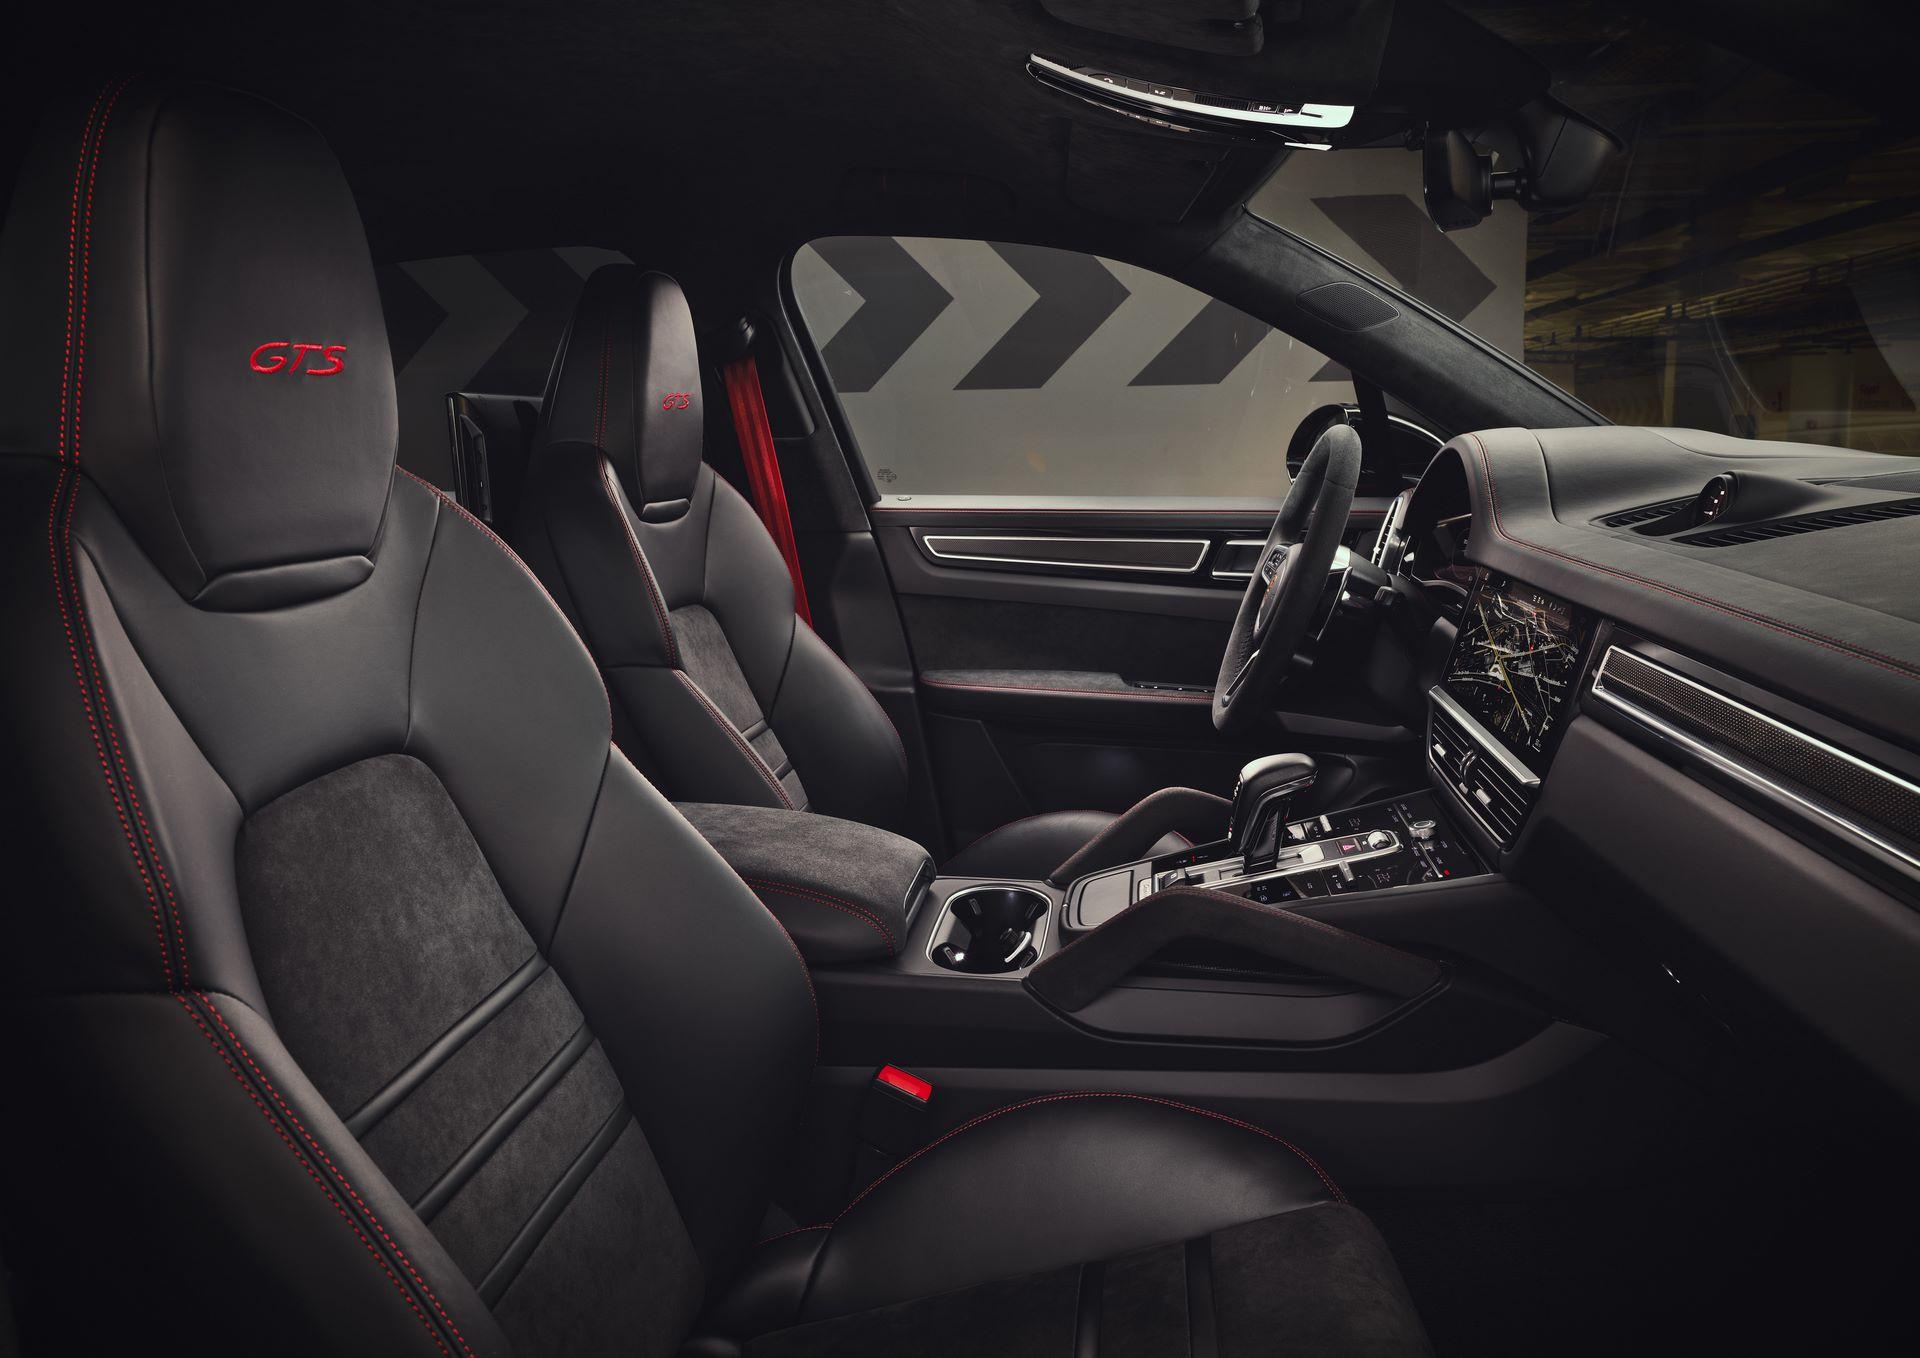 Porsche-Cayenne-GTS-and-Cayenne-GTS-Coupe-2021-20